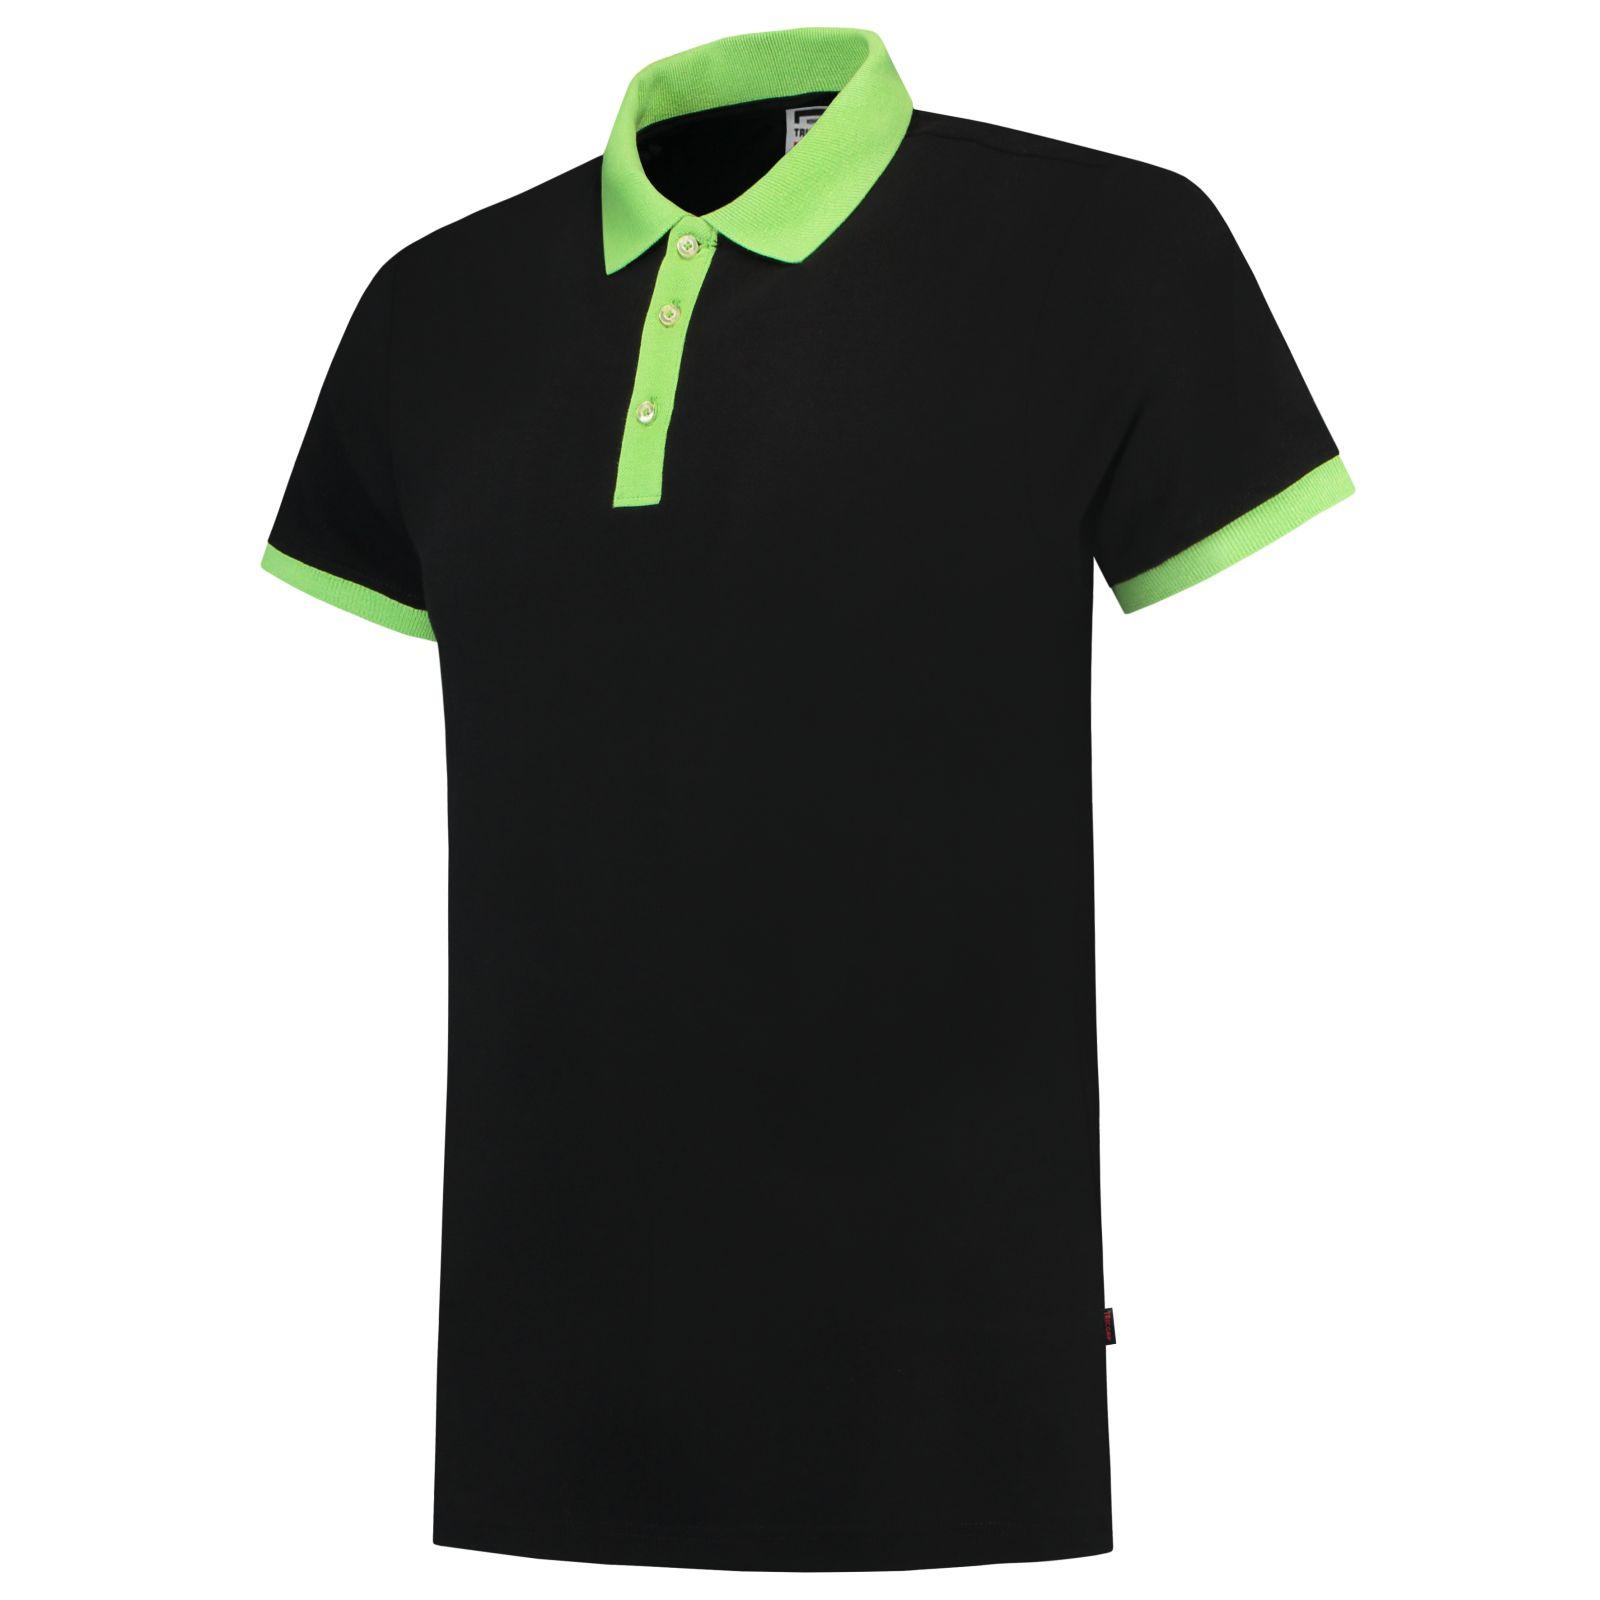 Tricorp Casual Poloshirts 201002-PBF210 zwart-limoen(BlackLime)